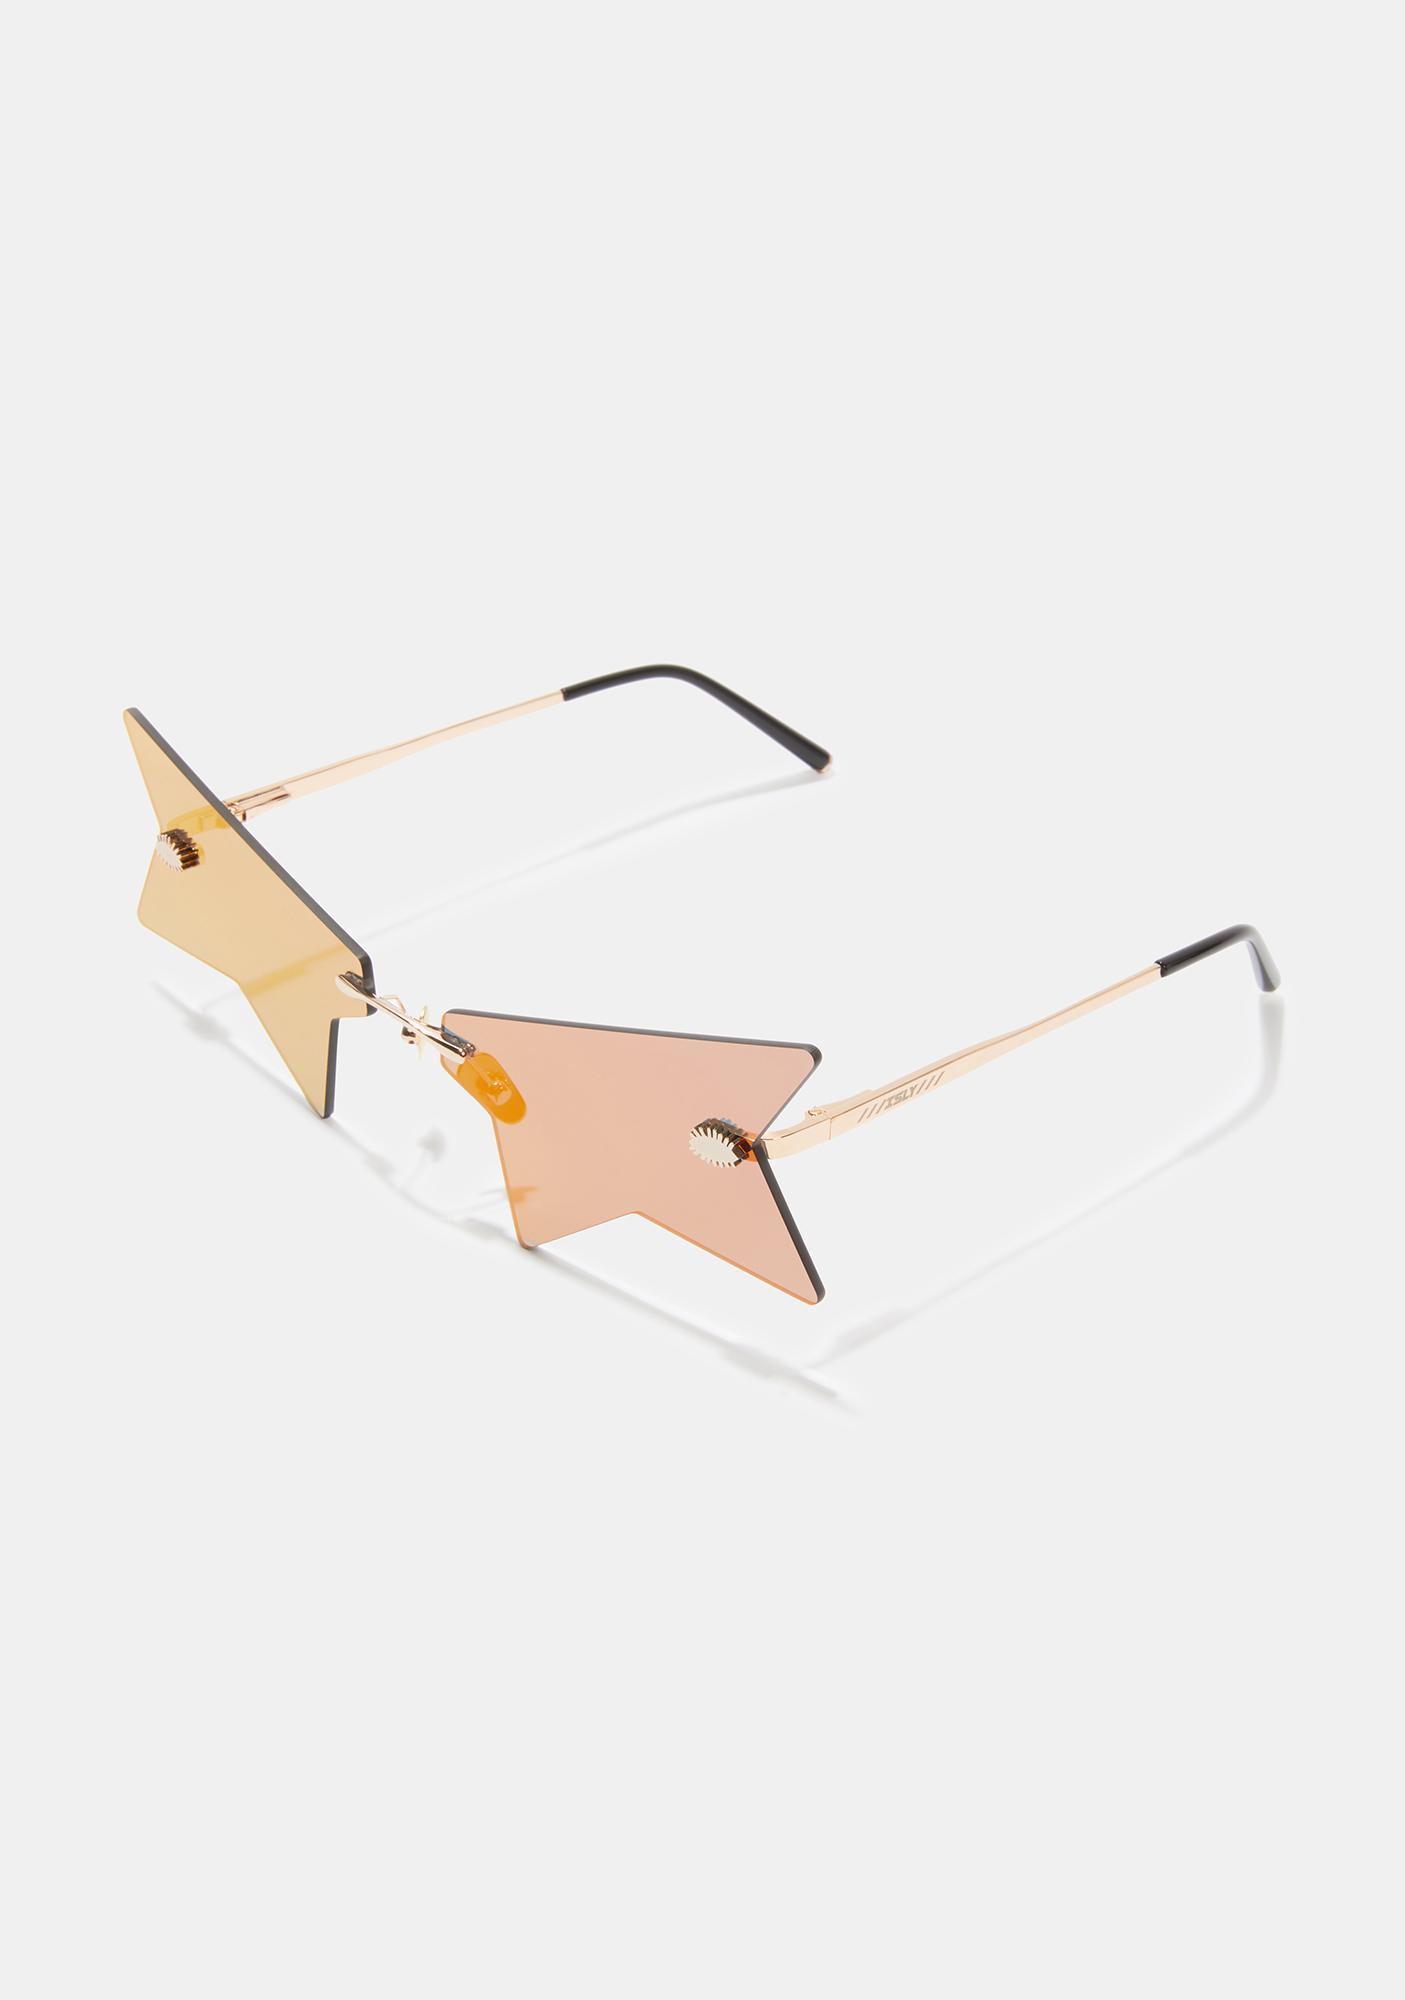 ISLYNYC Amber Rock Star Glasses